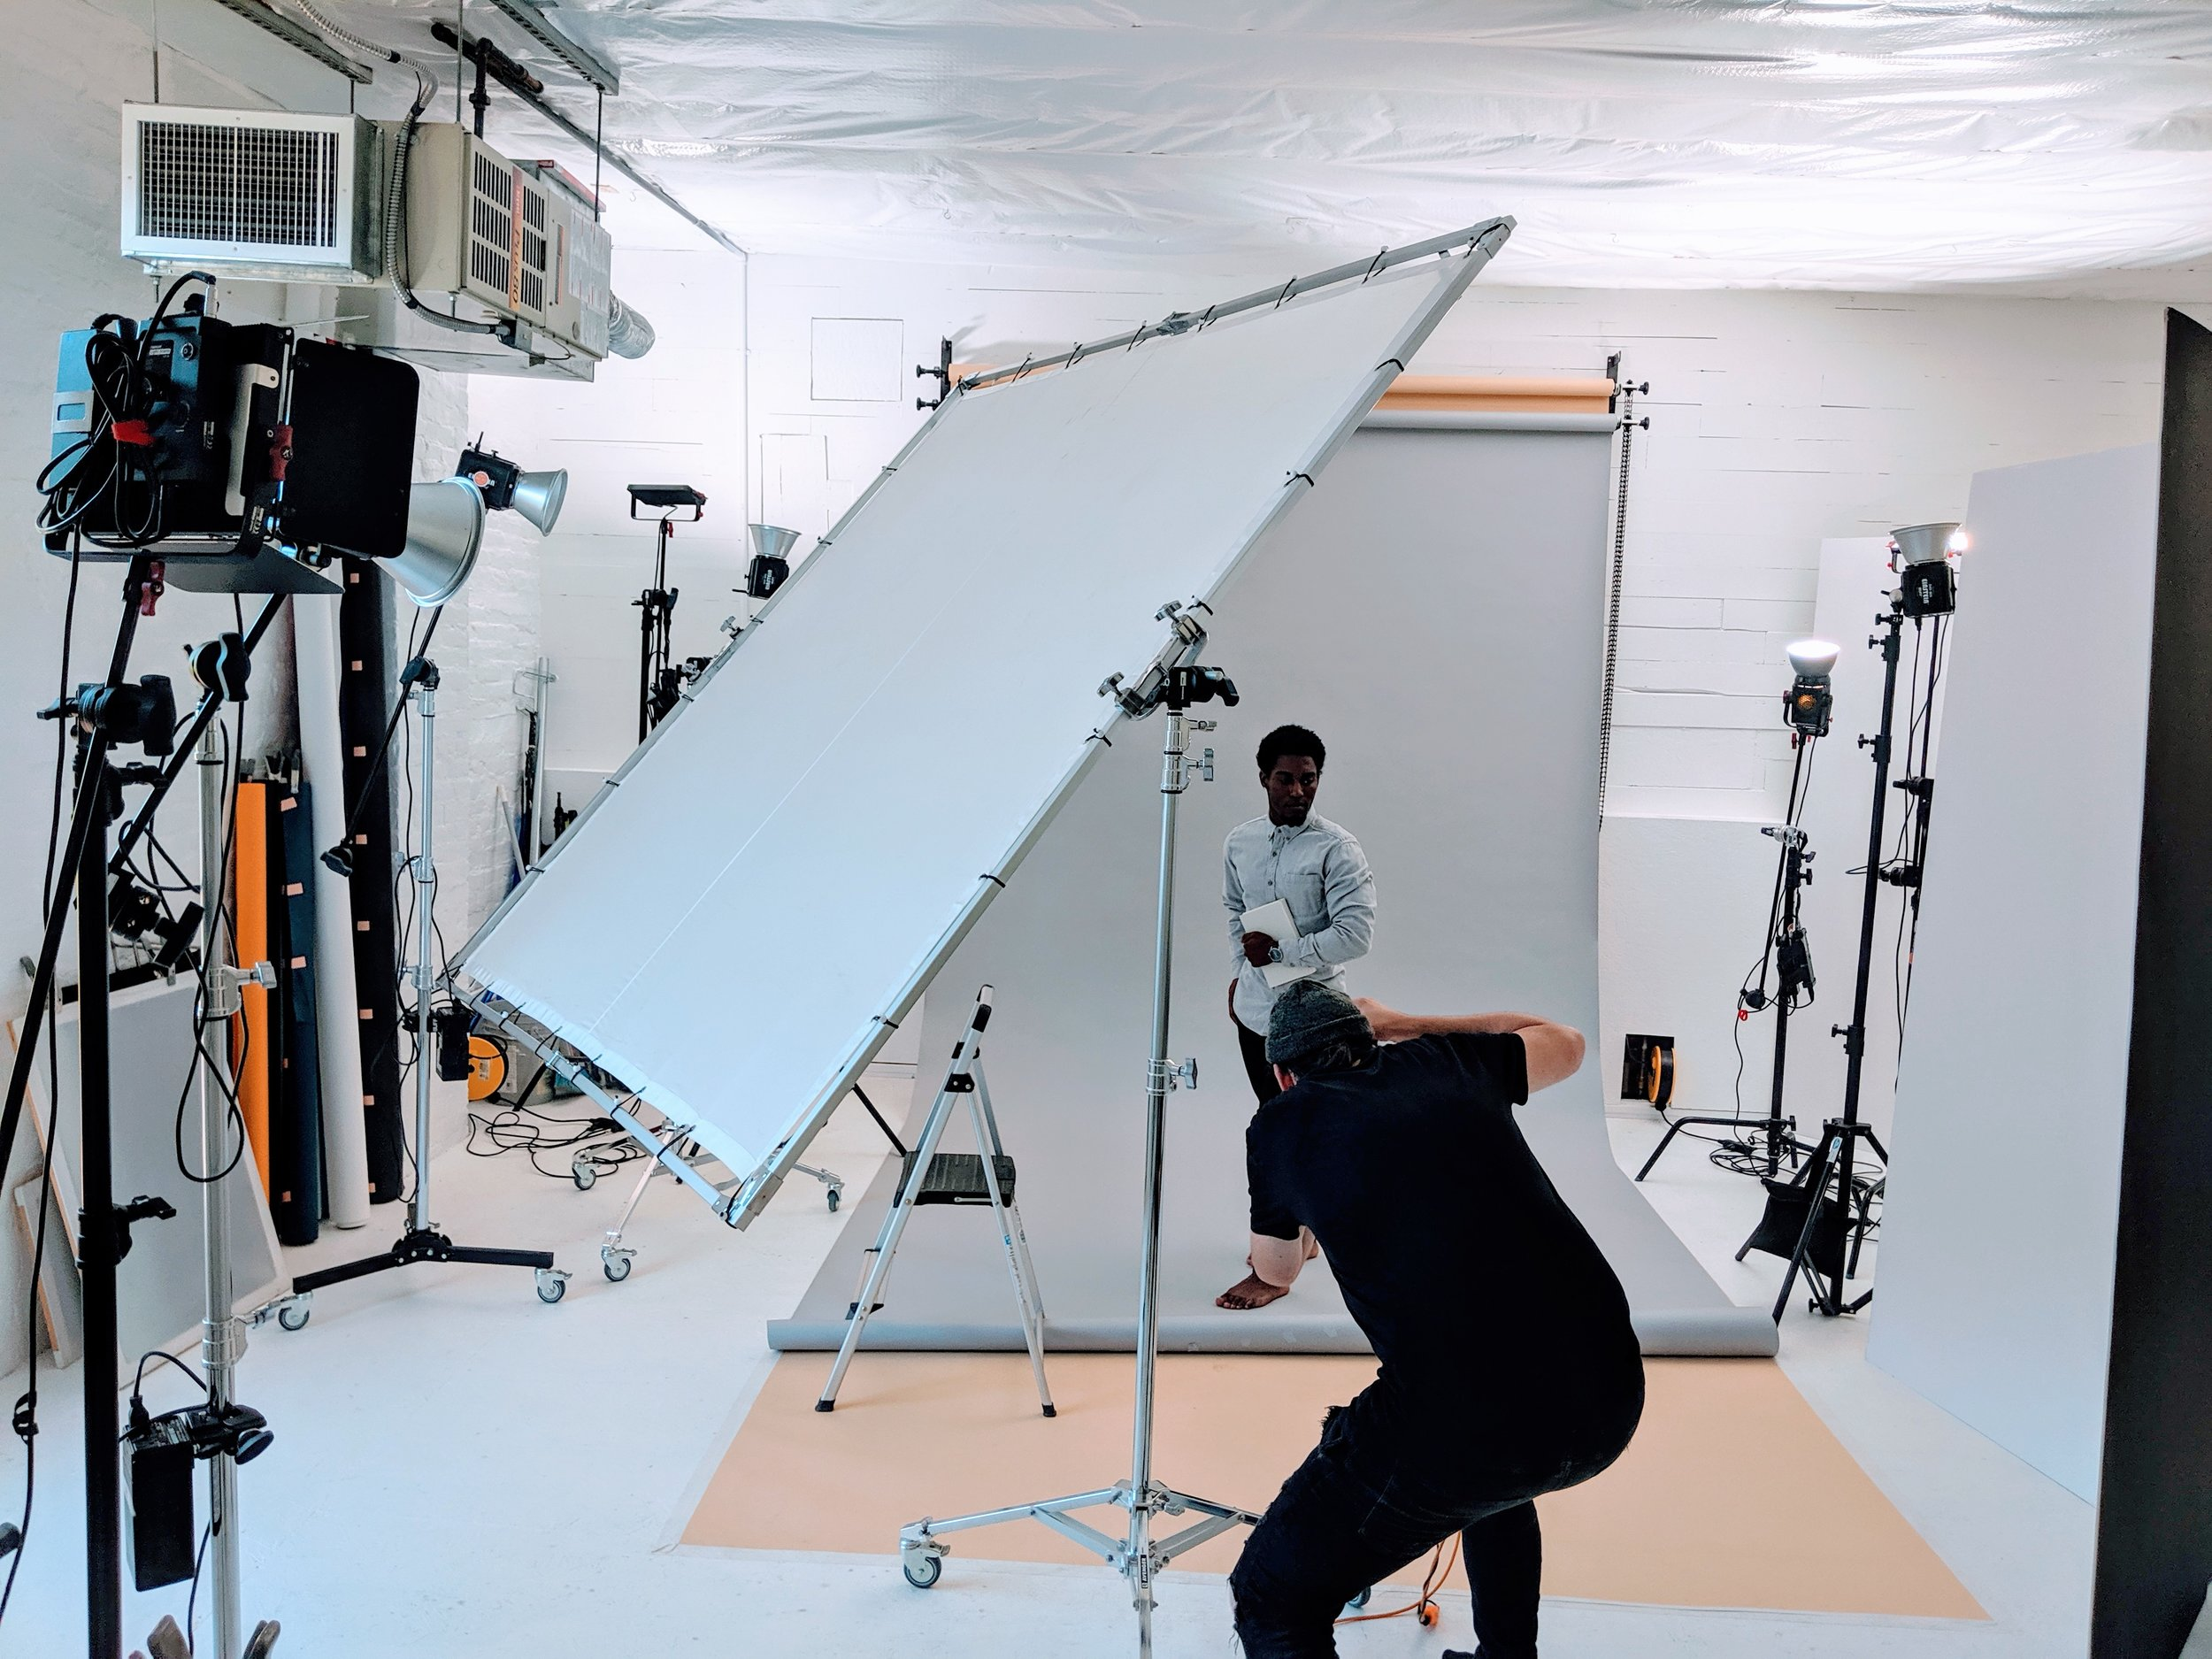 Everett-Snohimsh-photo-video-rental-studio-2.jpg